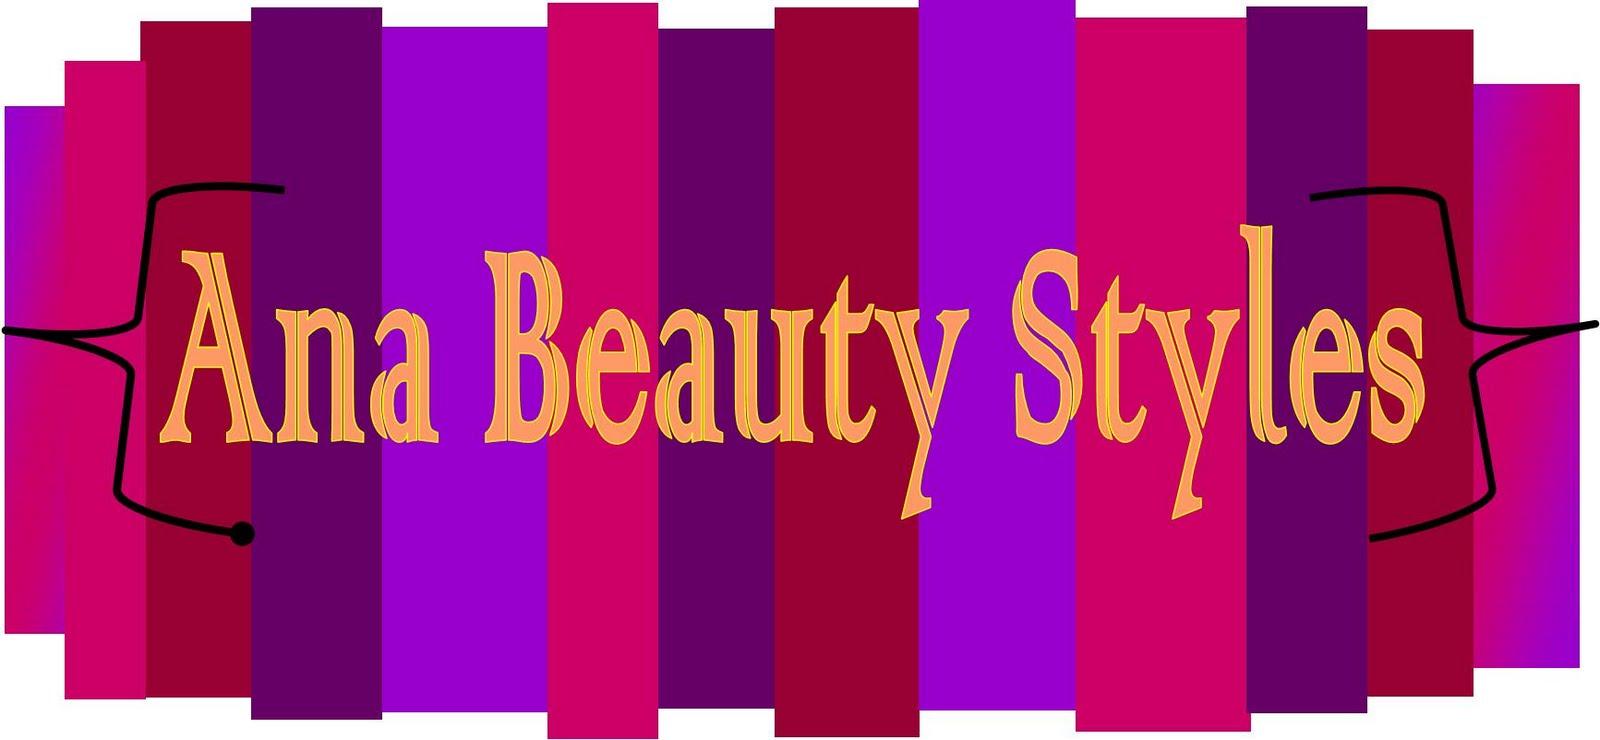 AnaBeauty Styles